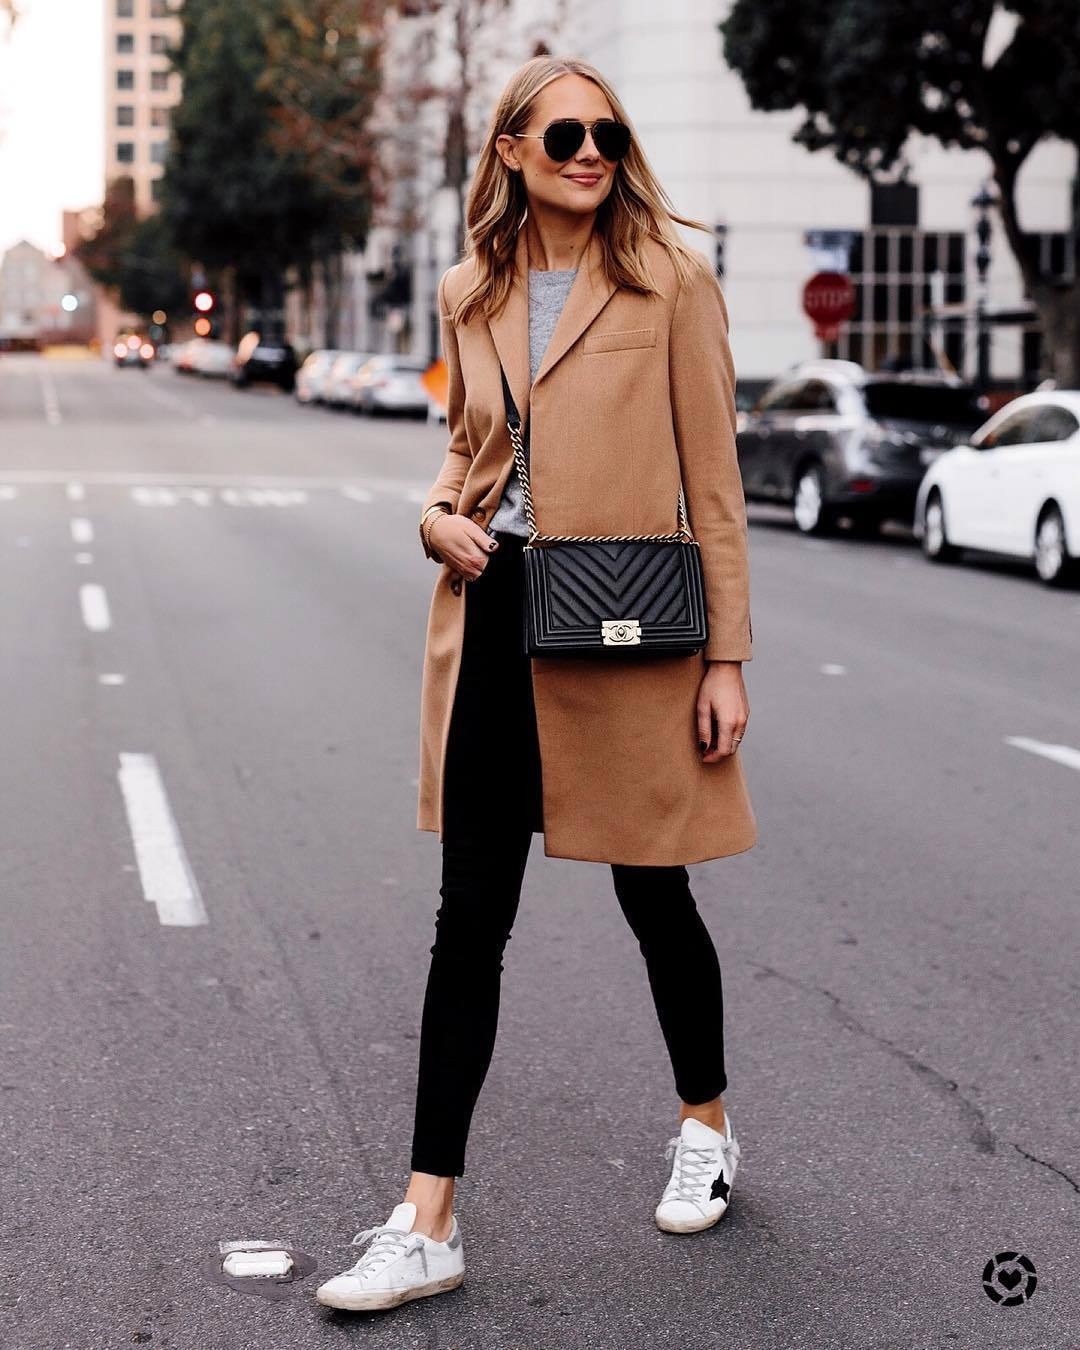 jeans black skinny jeans white sneakers black bag grey sweater camel coat sunglasses